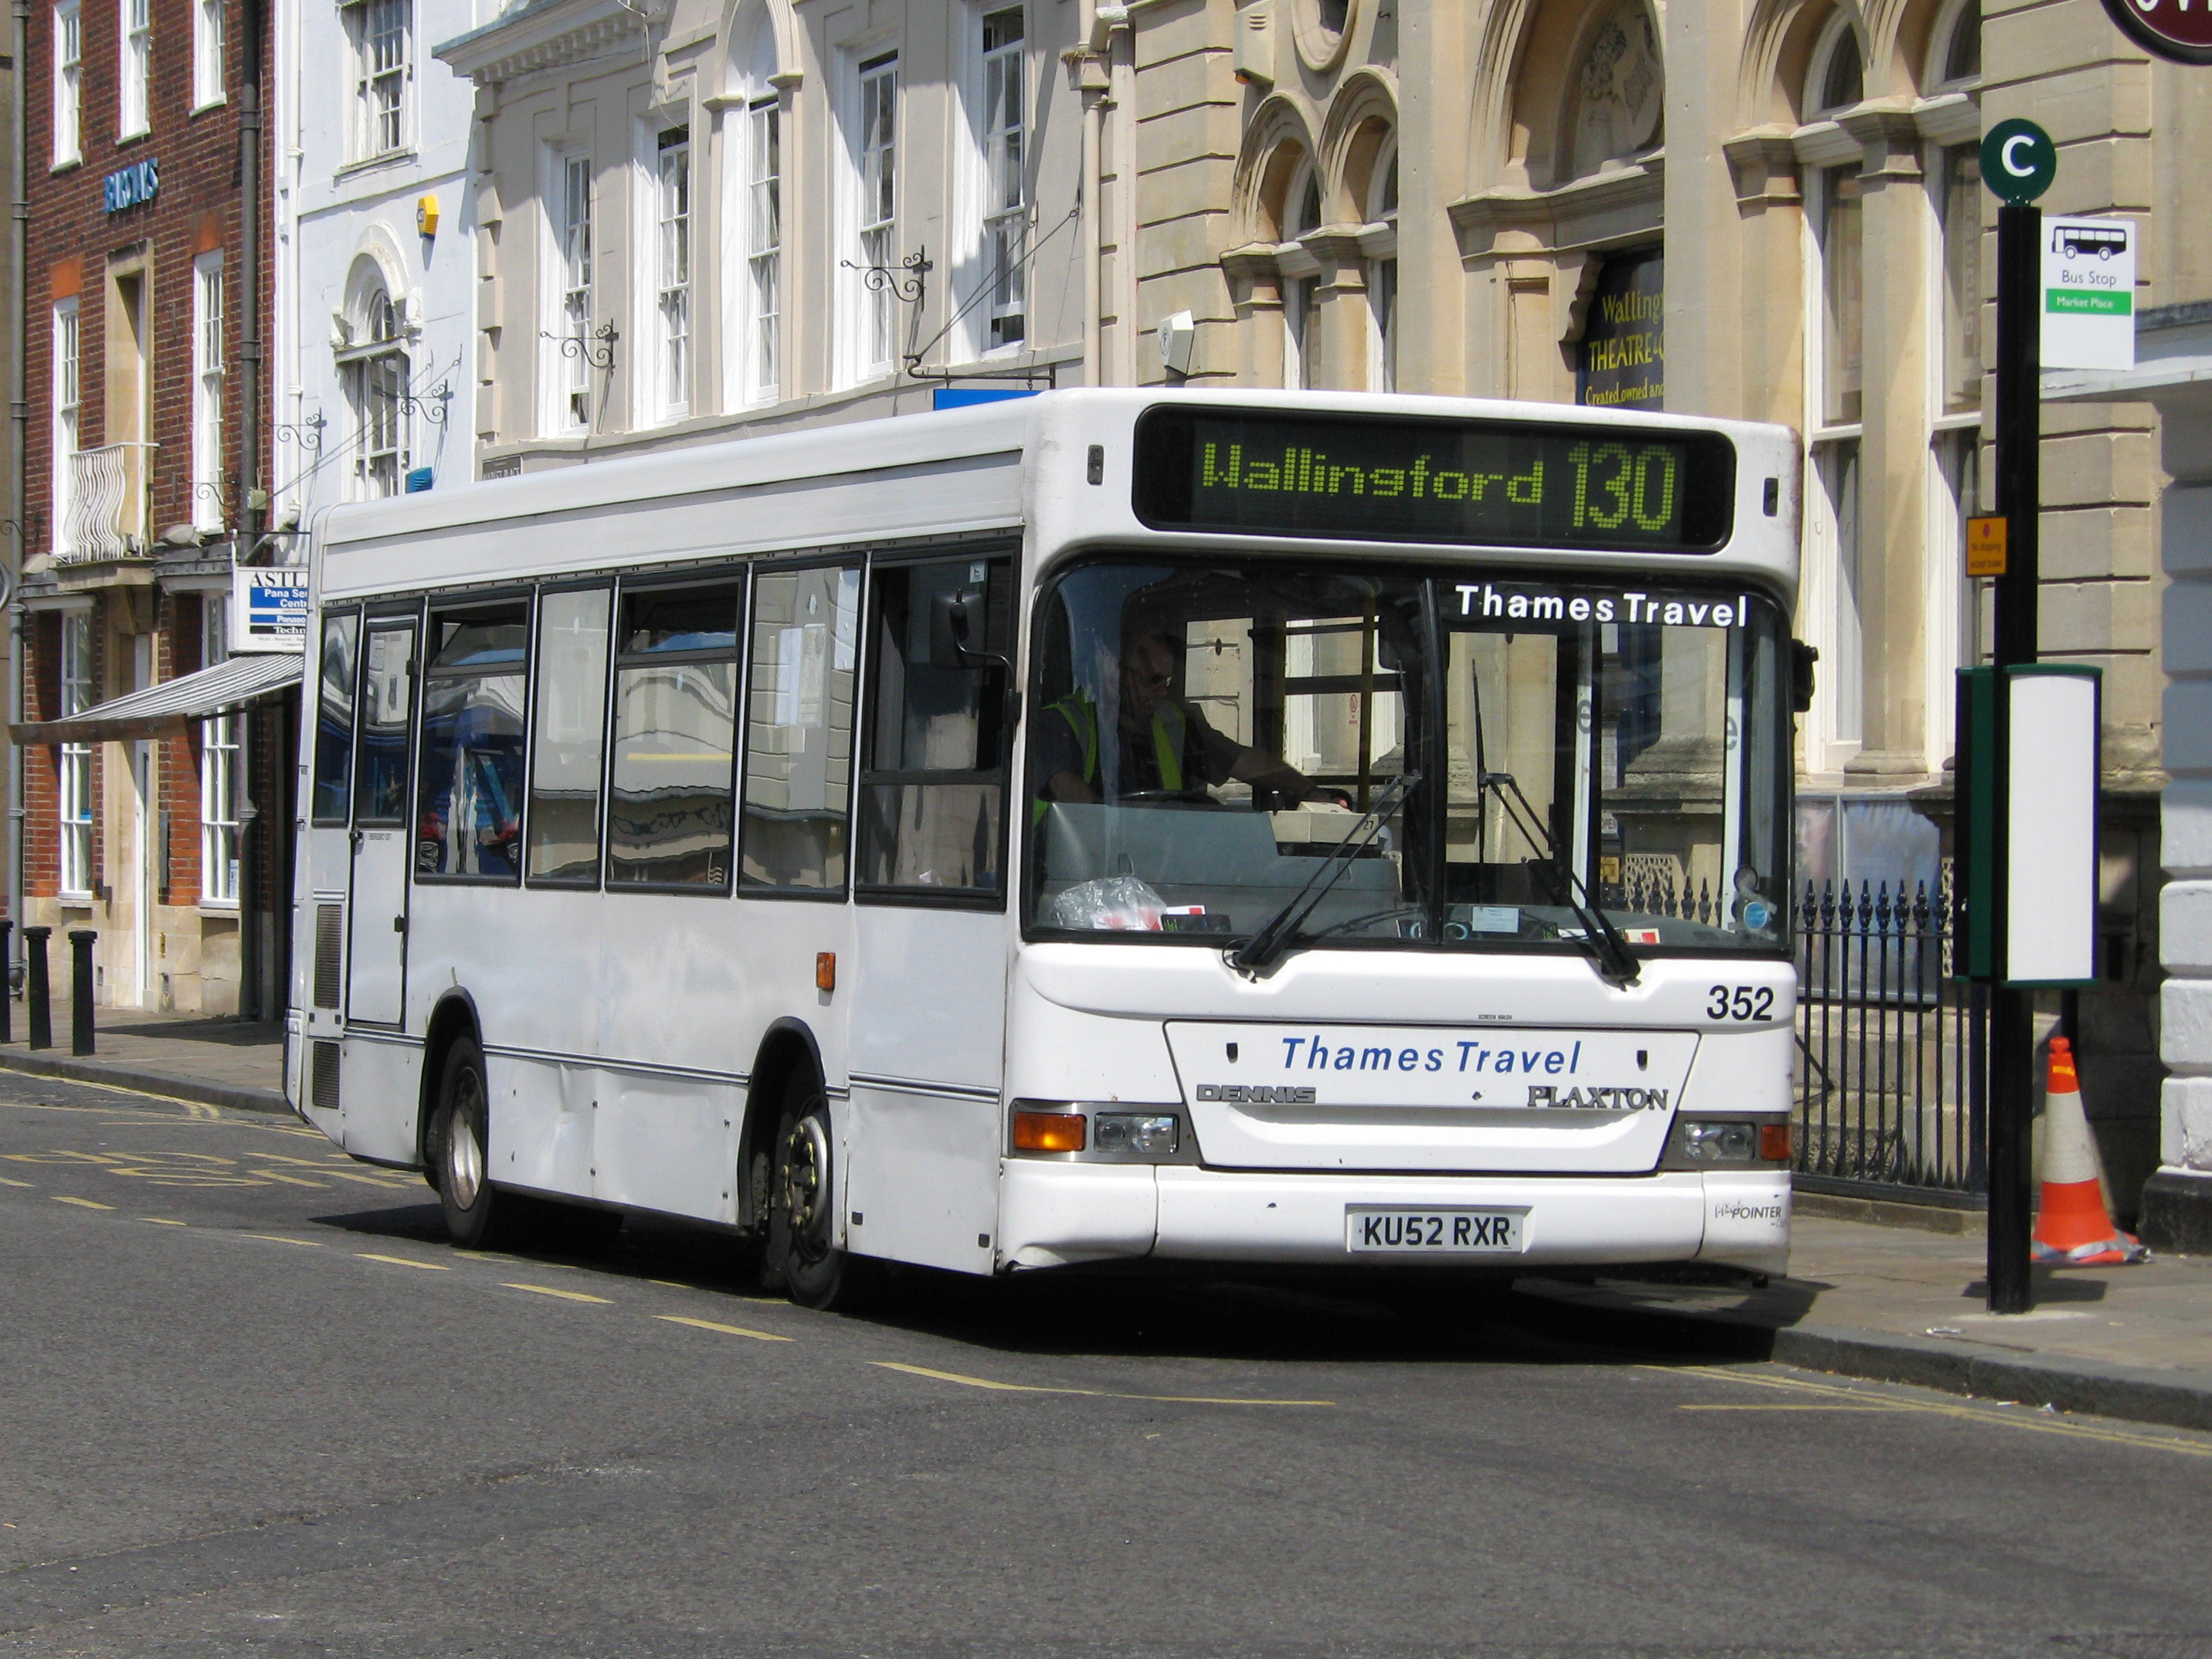 file:bus img 2479 (16172720137) - wikimedia commons